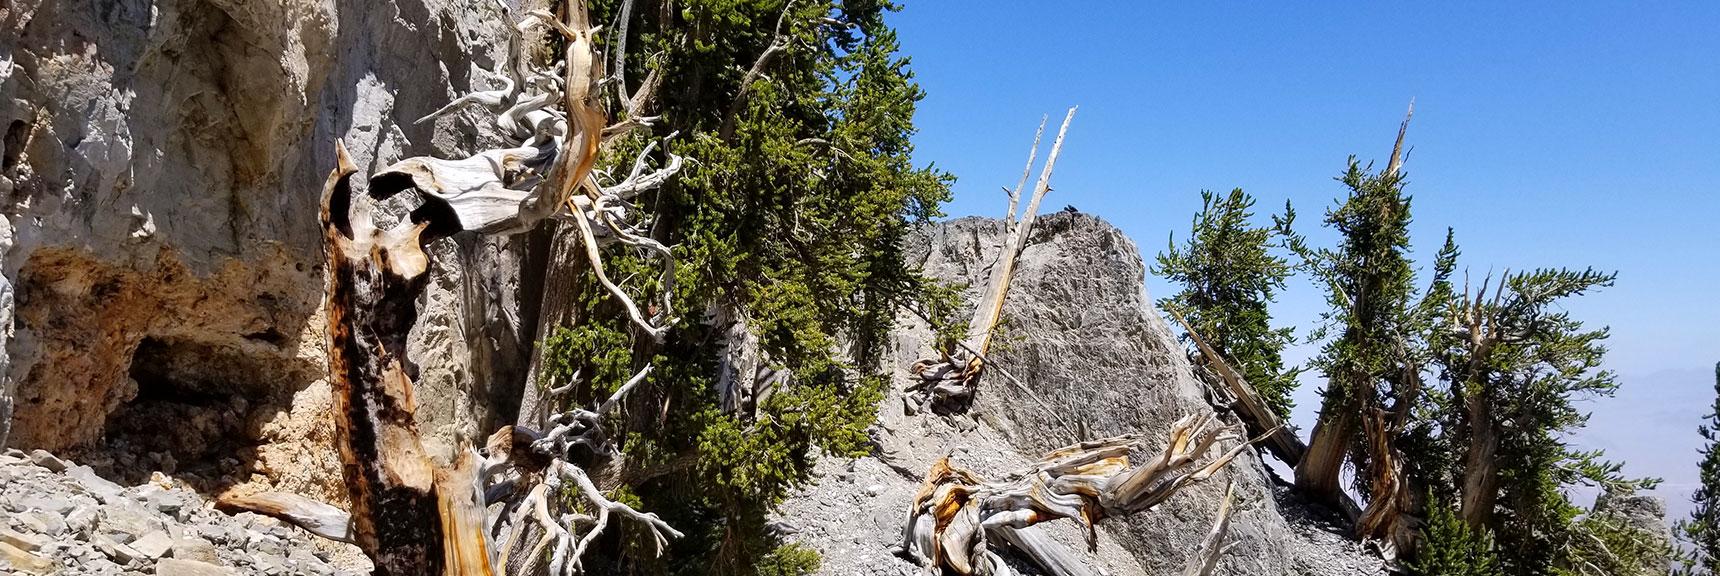 Closer Look Across to the Ledge Below Mummy Mt. East Summit in Mt Charleston Wilderness, Nevada